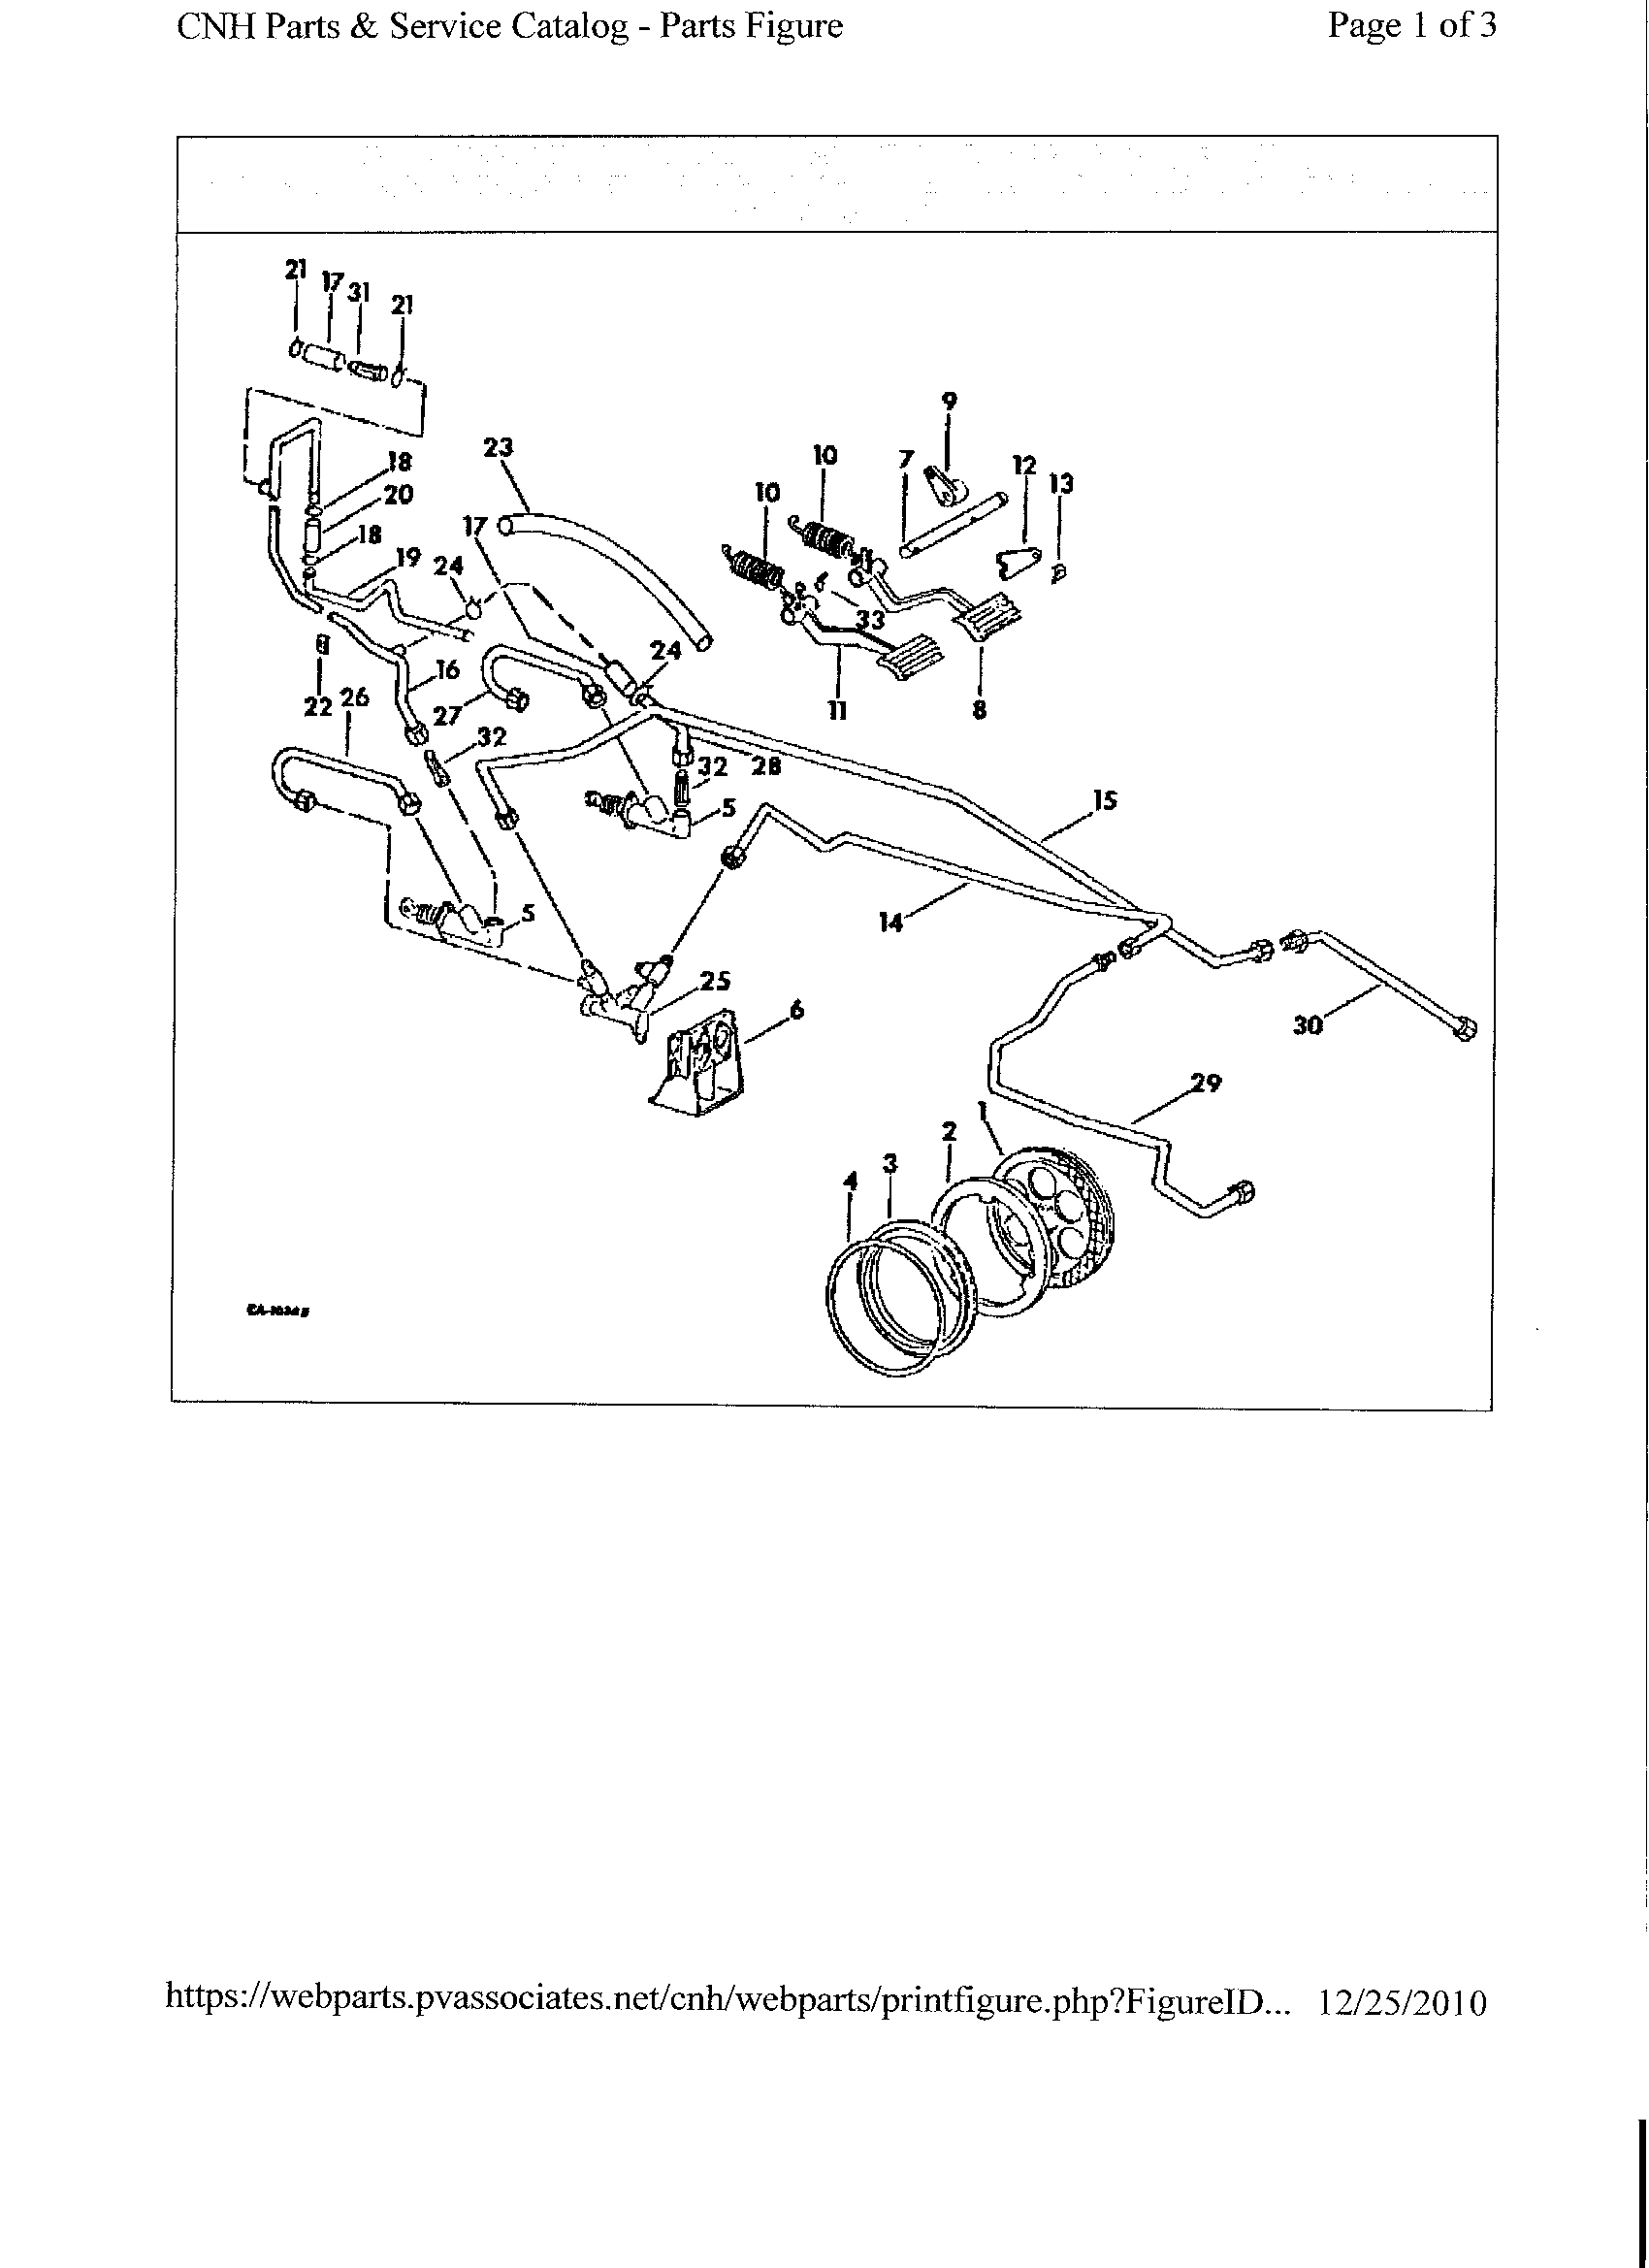 International Harvester B414 Wiring Diagram - Wiring Diagram